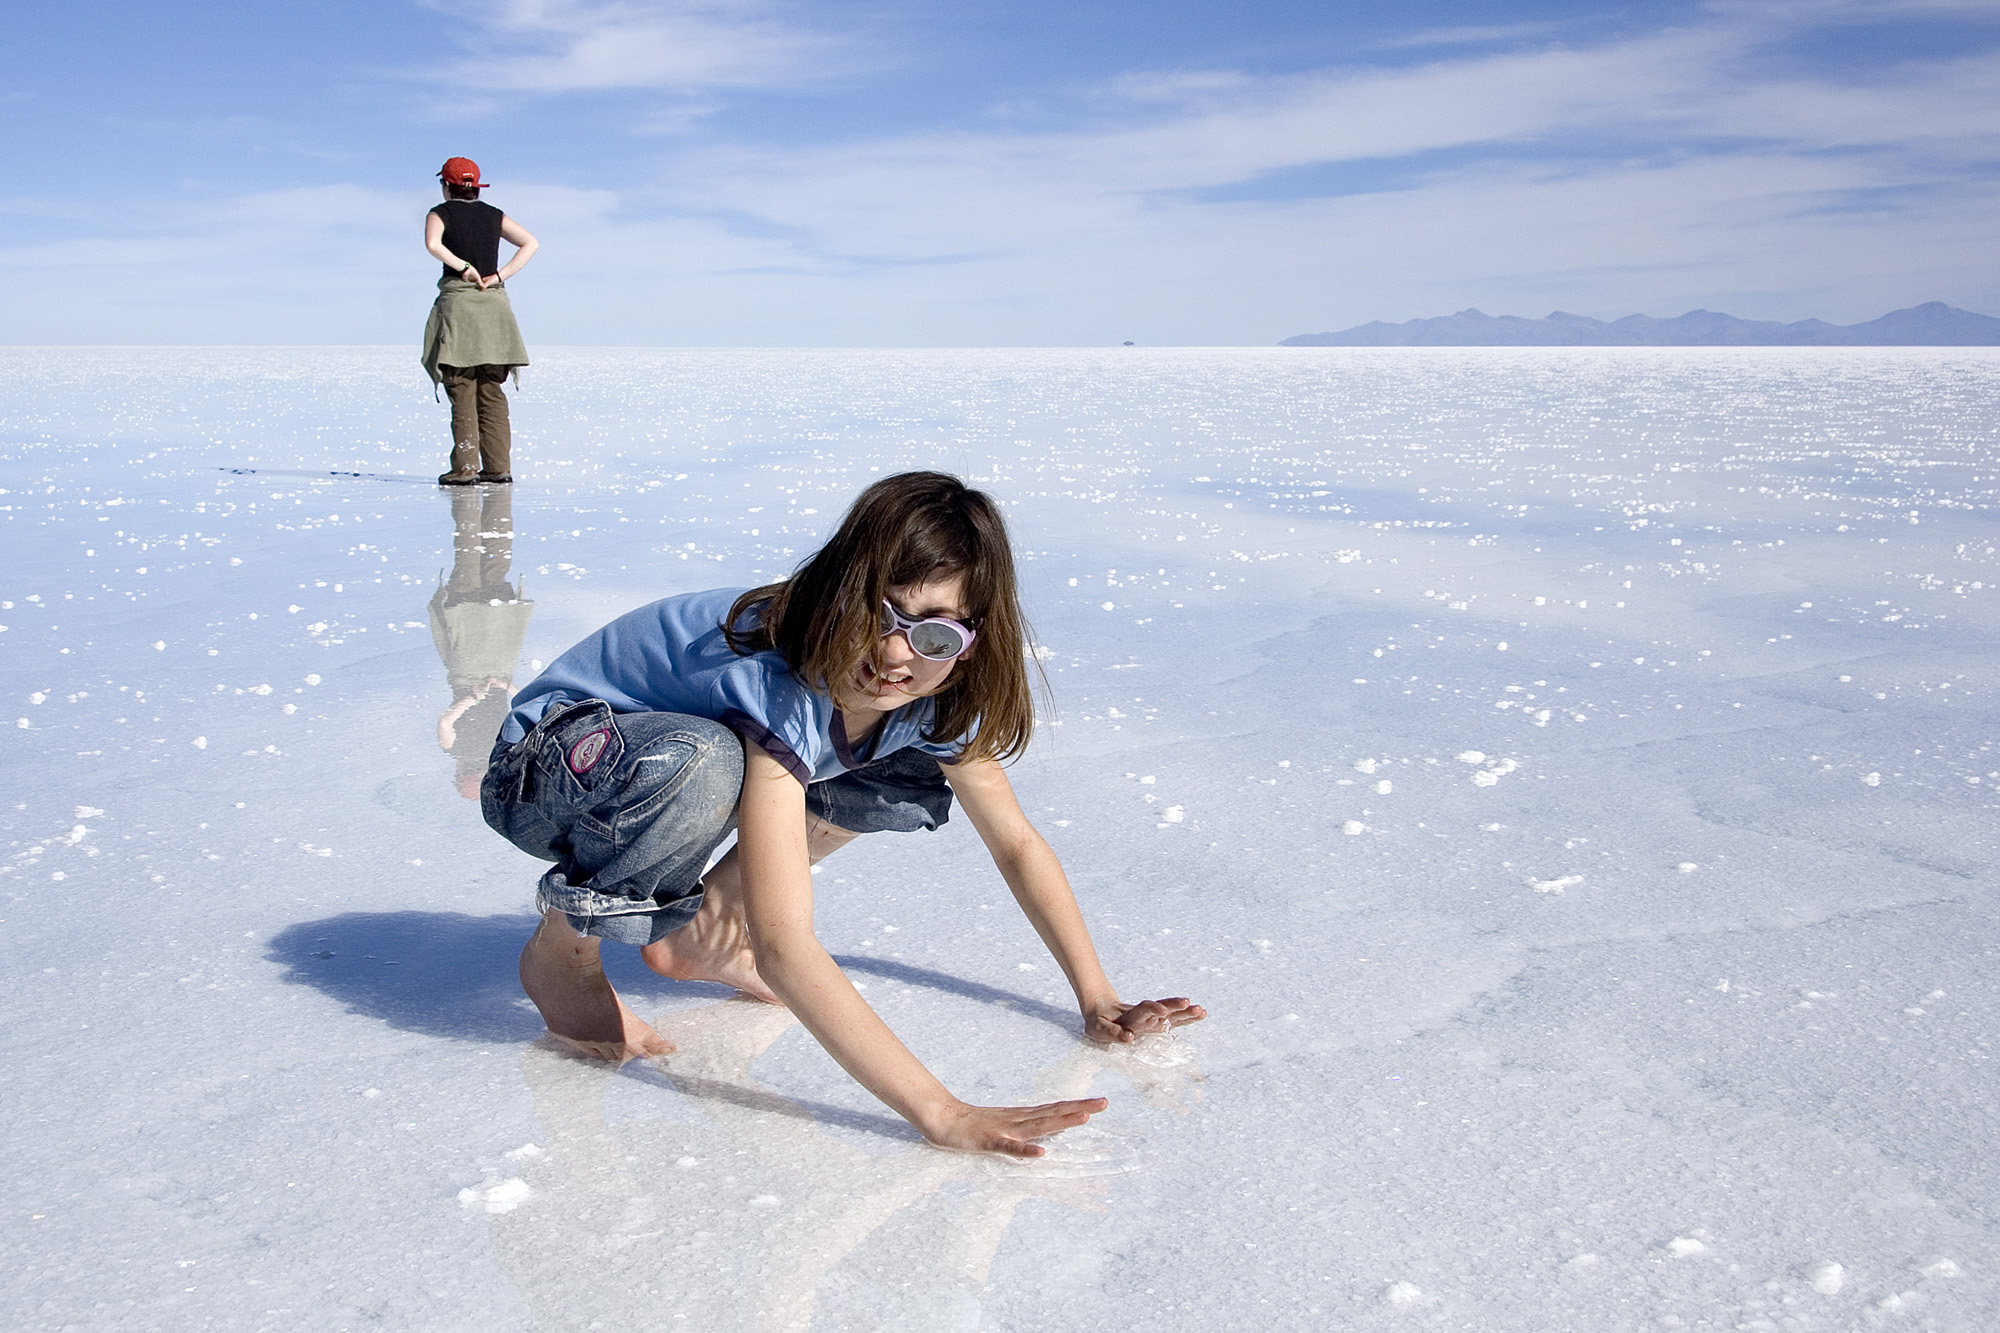 Mesta na Zemlji sa vanzemaljskim izgledom Giulia_on_wet_Salar_de_Uyuni_Bolivia_Luca_Galuzzi_2006